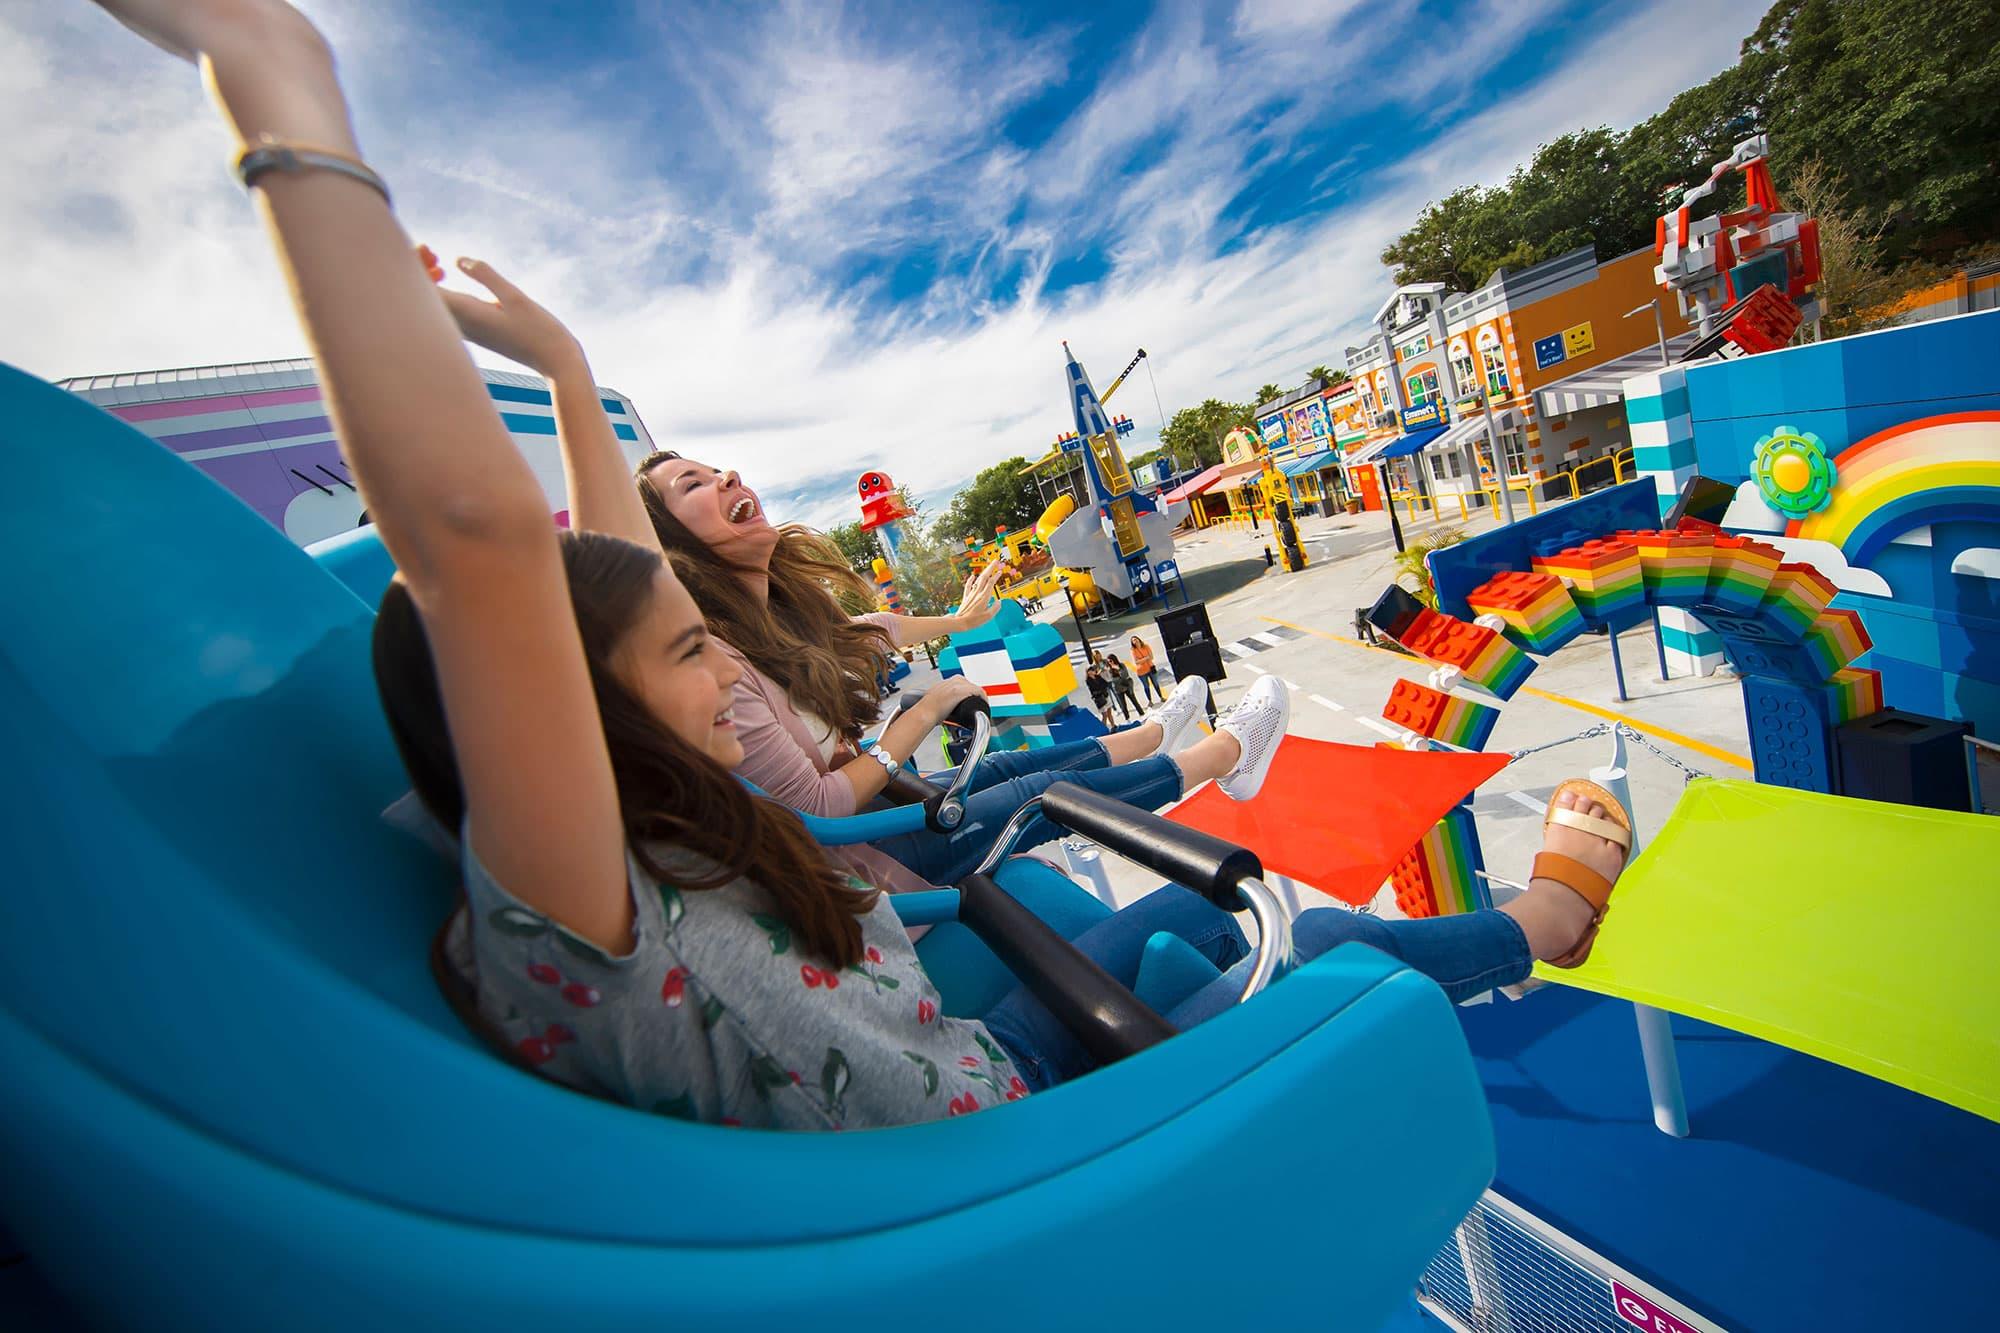 LEGO Movie World Unikitty's Disco Drop ride at LEGOLAND Florida Resort in Winter Haven, FL